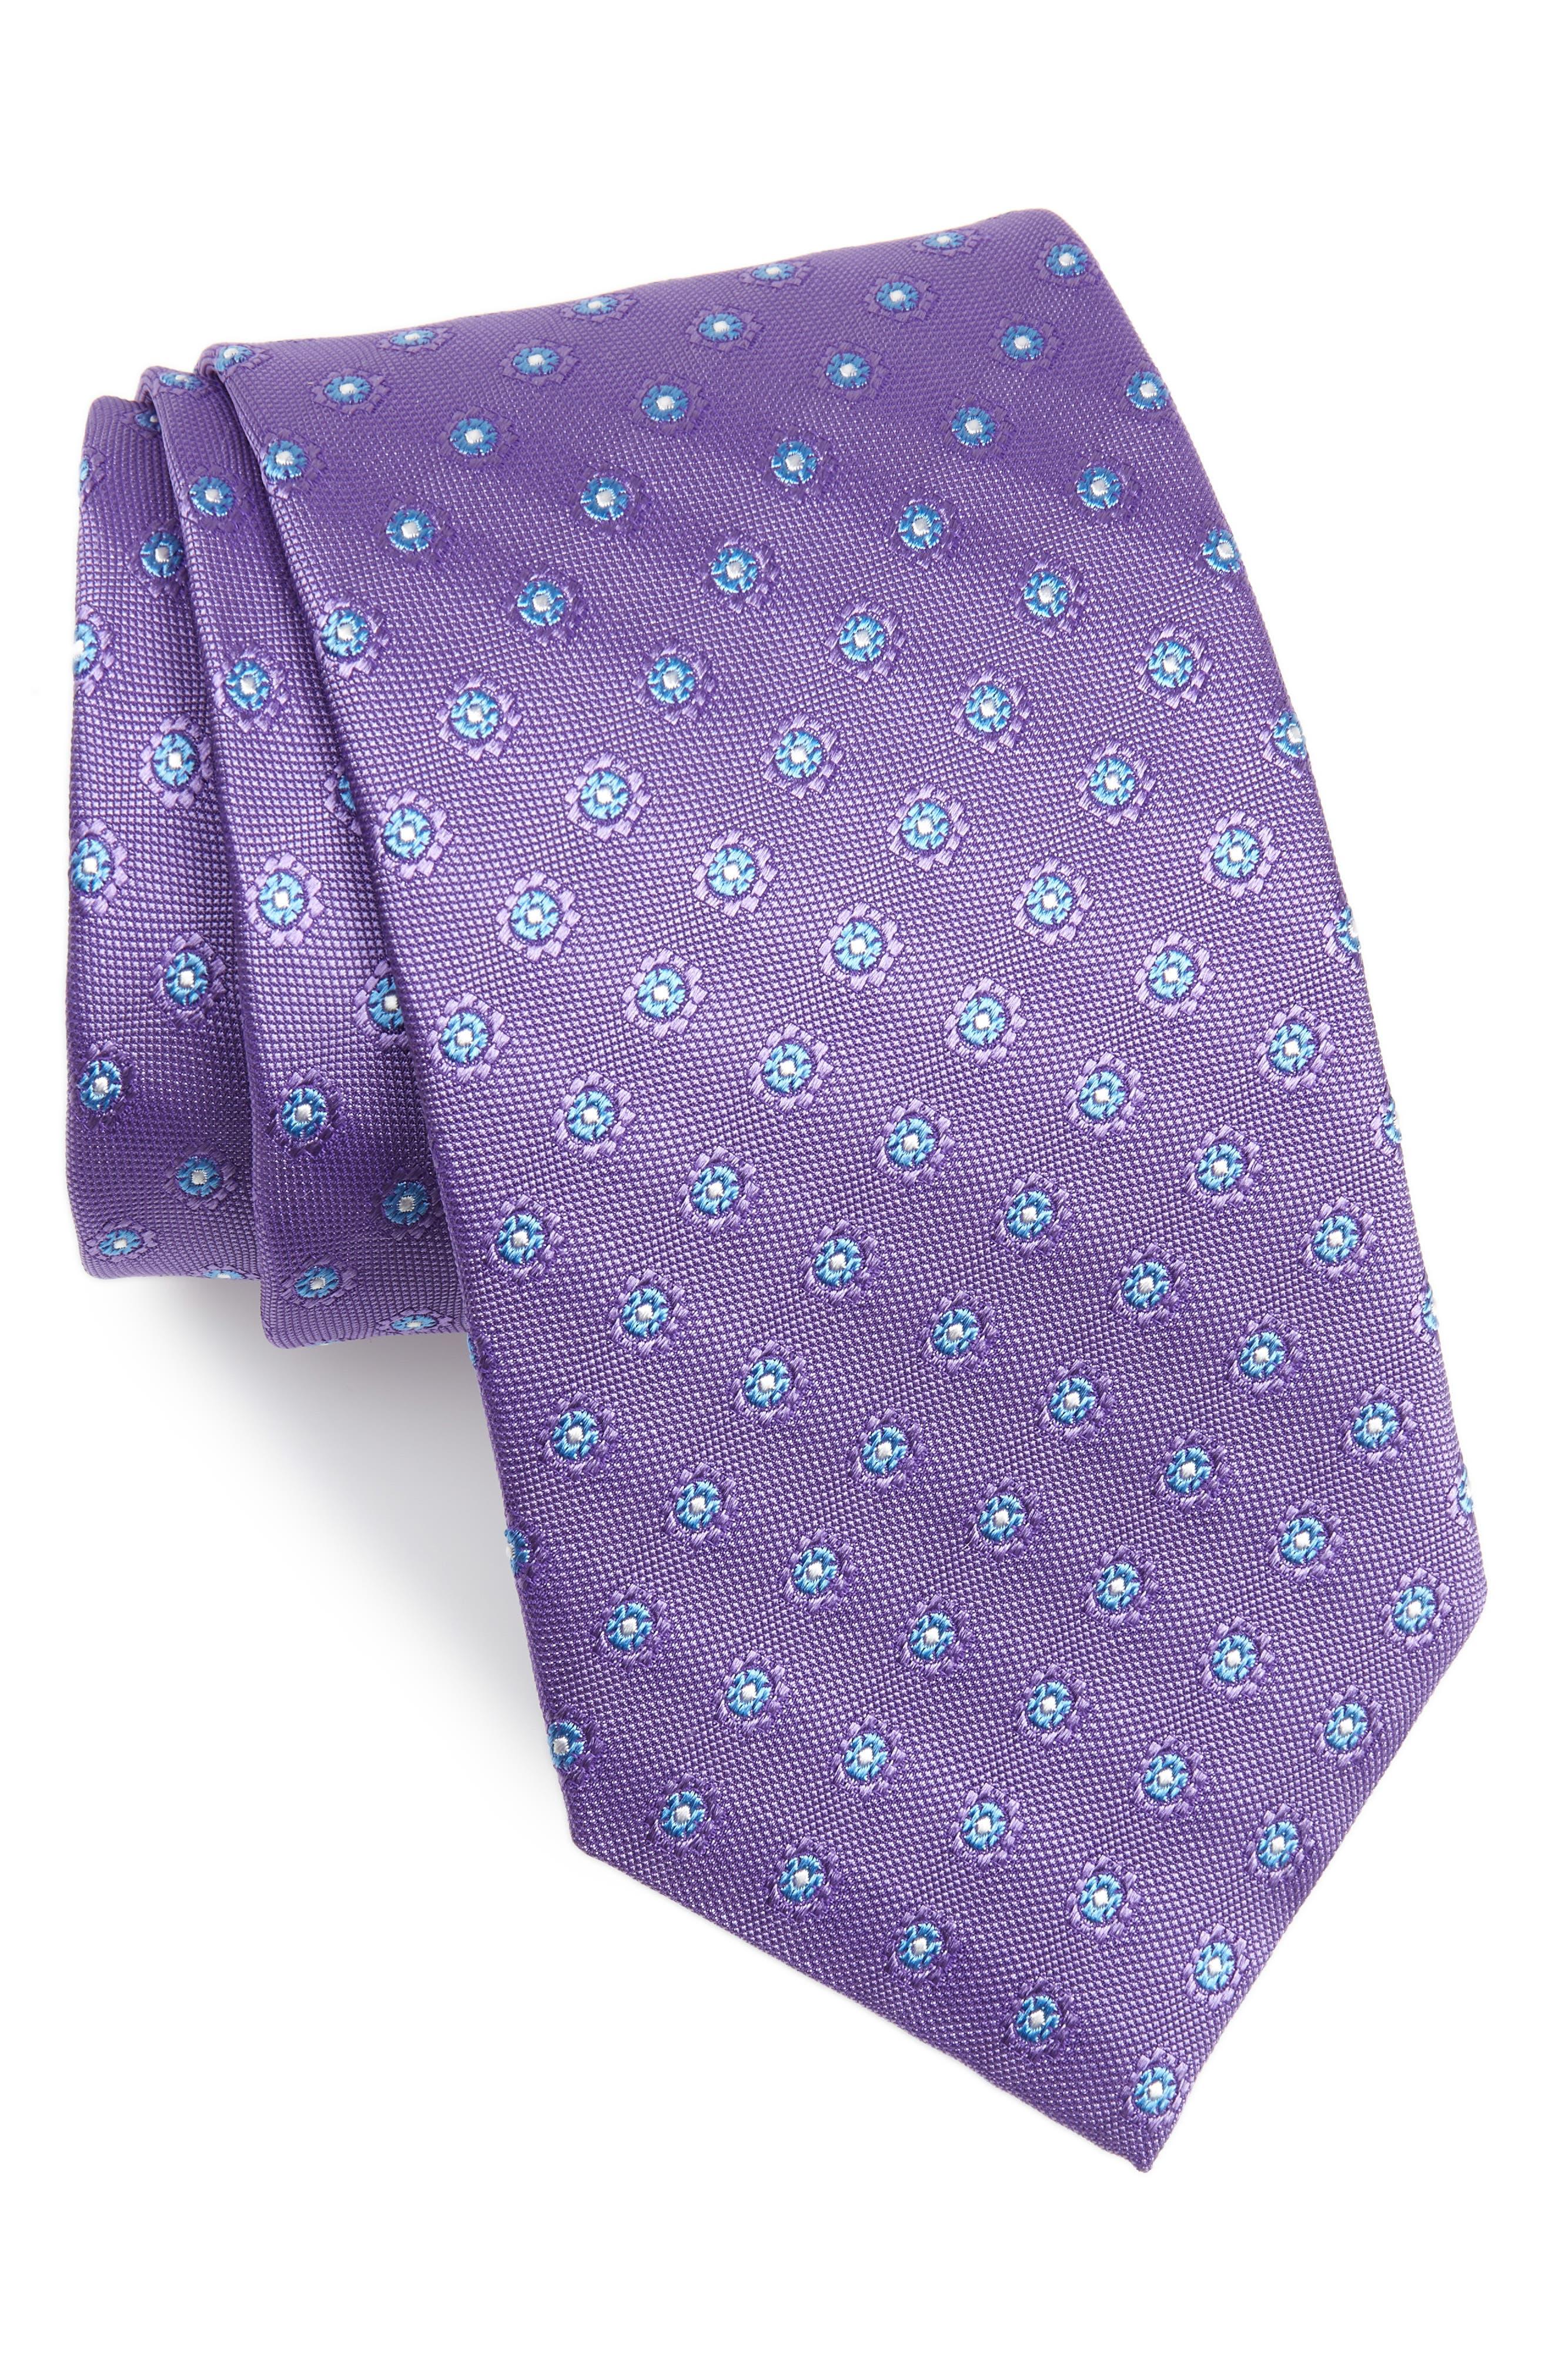 DAVID DONAHUE Flower Medallion Silk X-Long Tie, Main, color, PURPLE